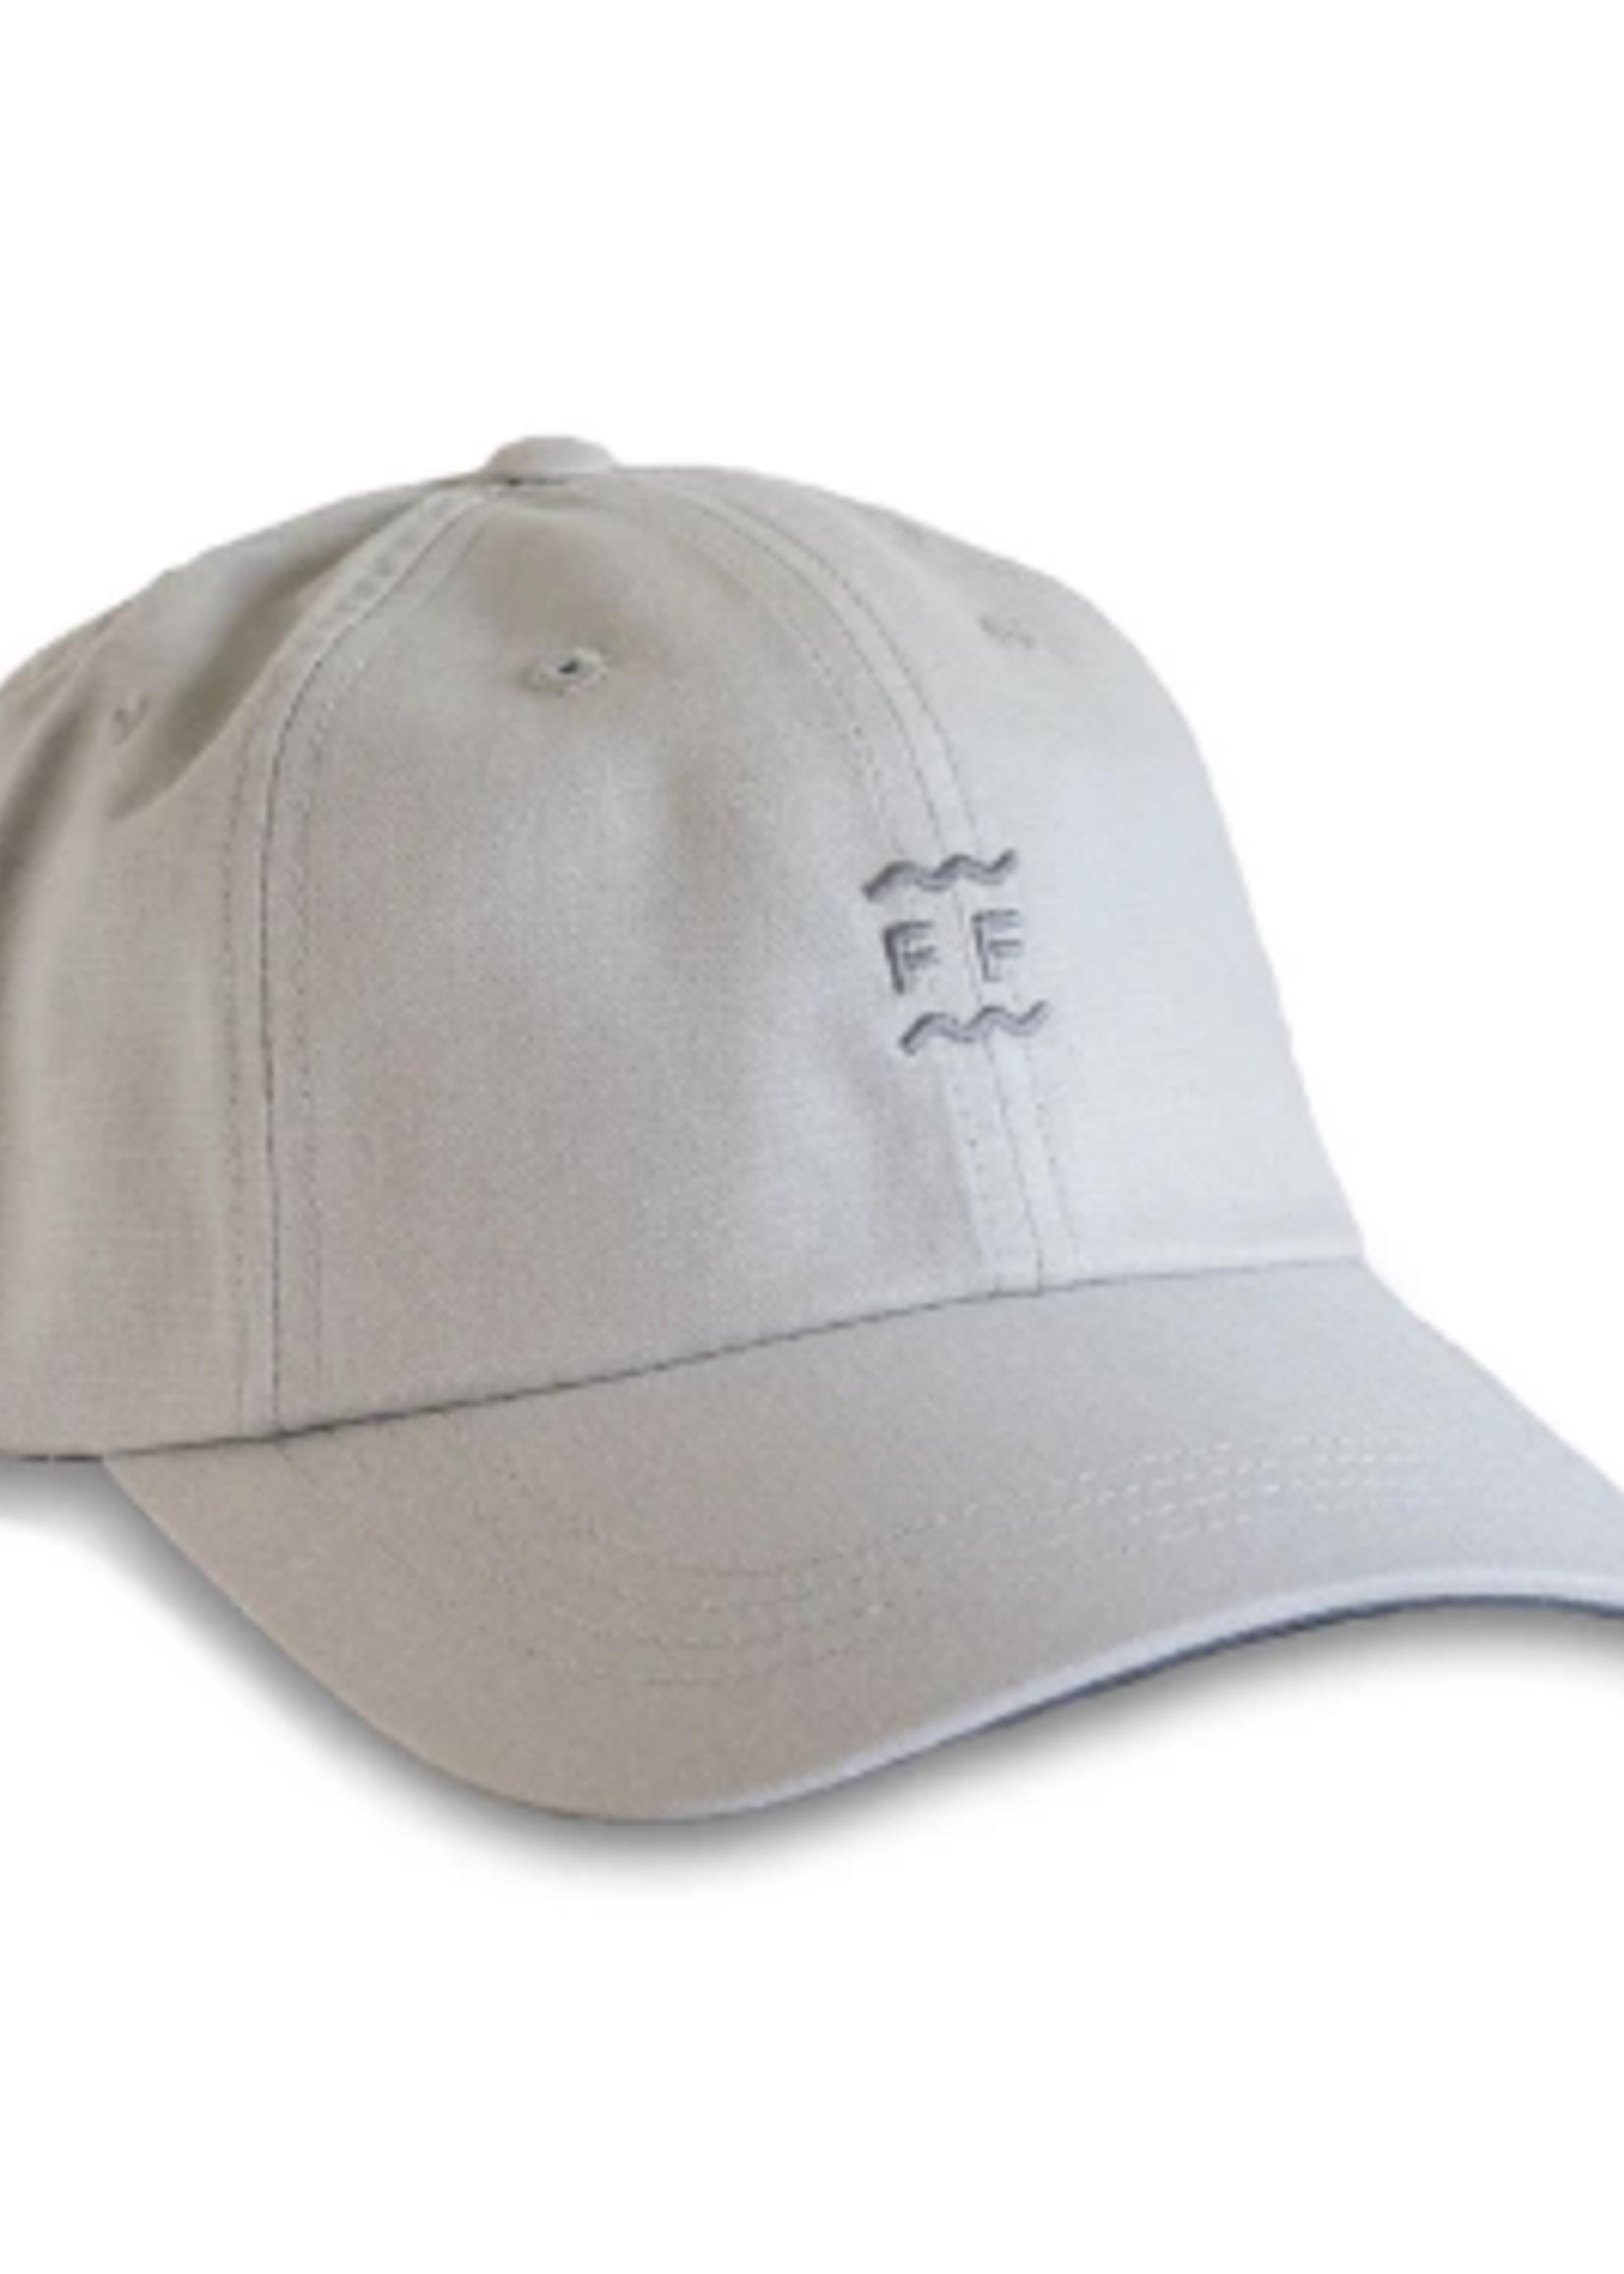 Free Fly Daytripper Hat